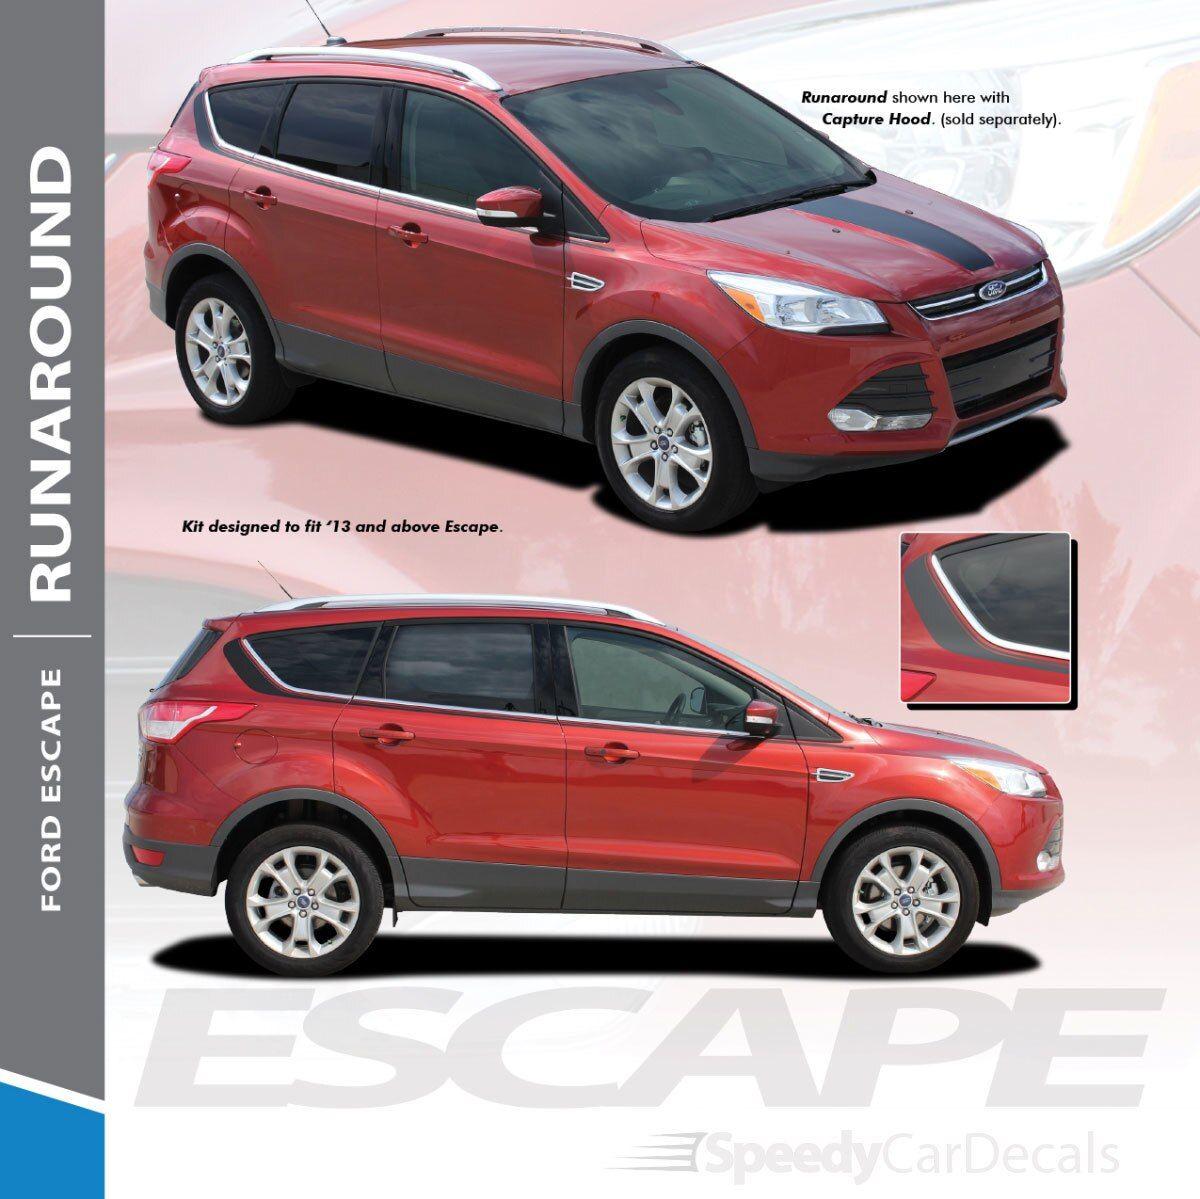 Ford Escape Upper Body Stripe Decals Runaround 3m 2013 2019 Premium And Supreme Install Carros